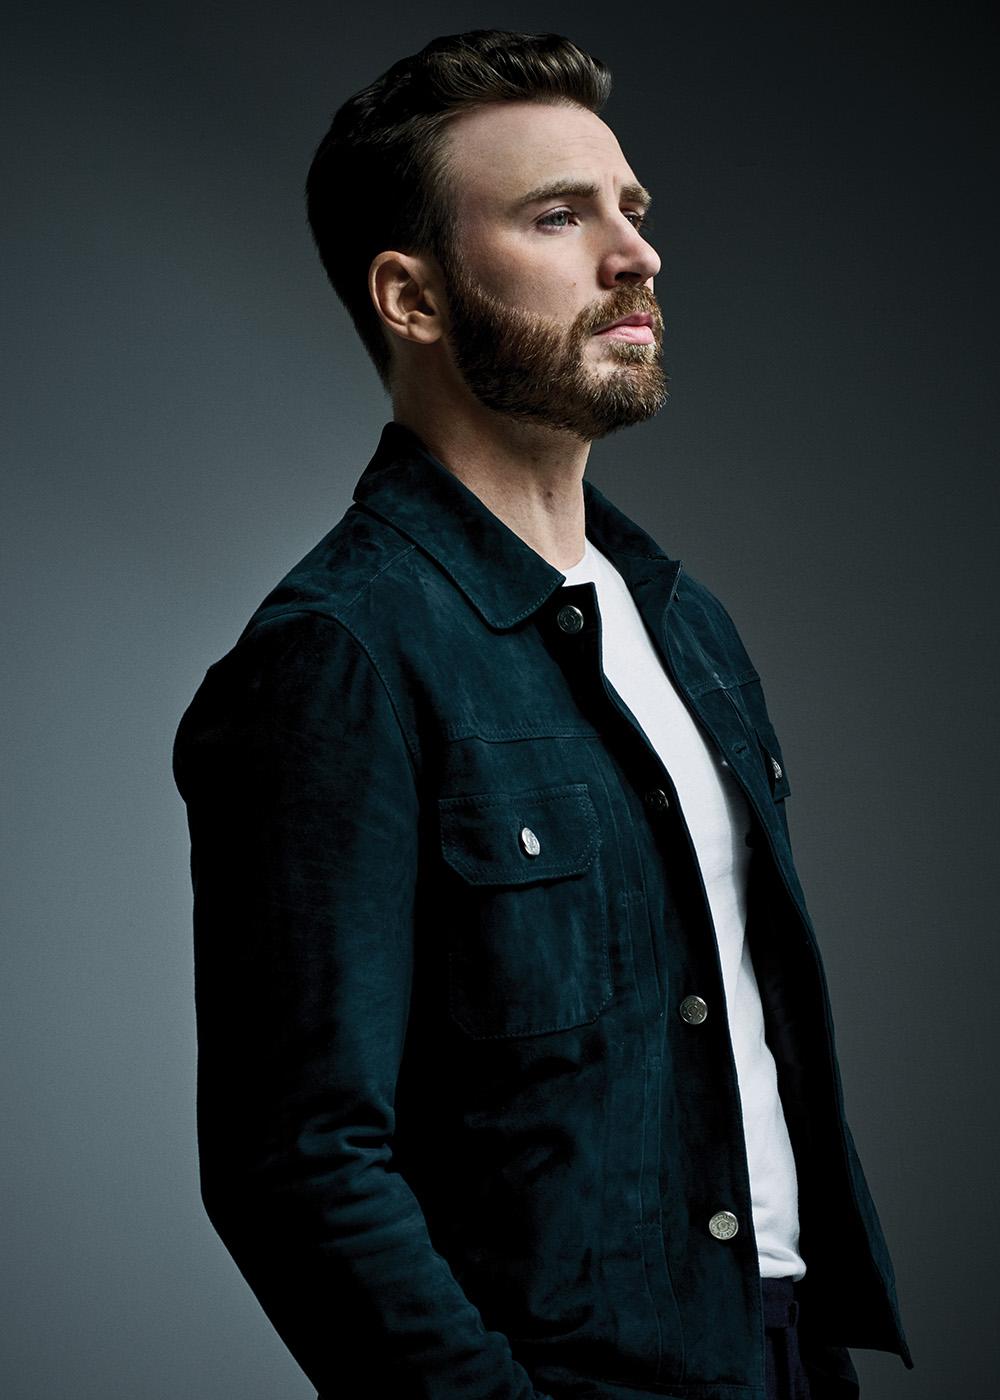 Chris Evans Actors on Actors